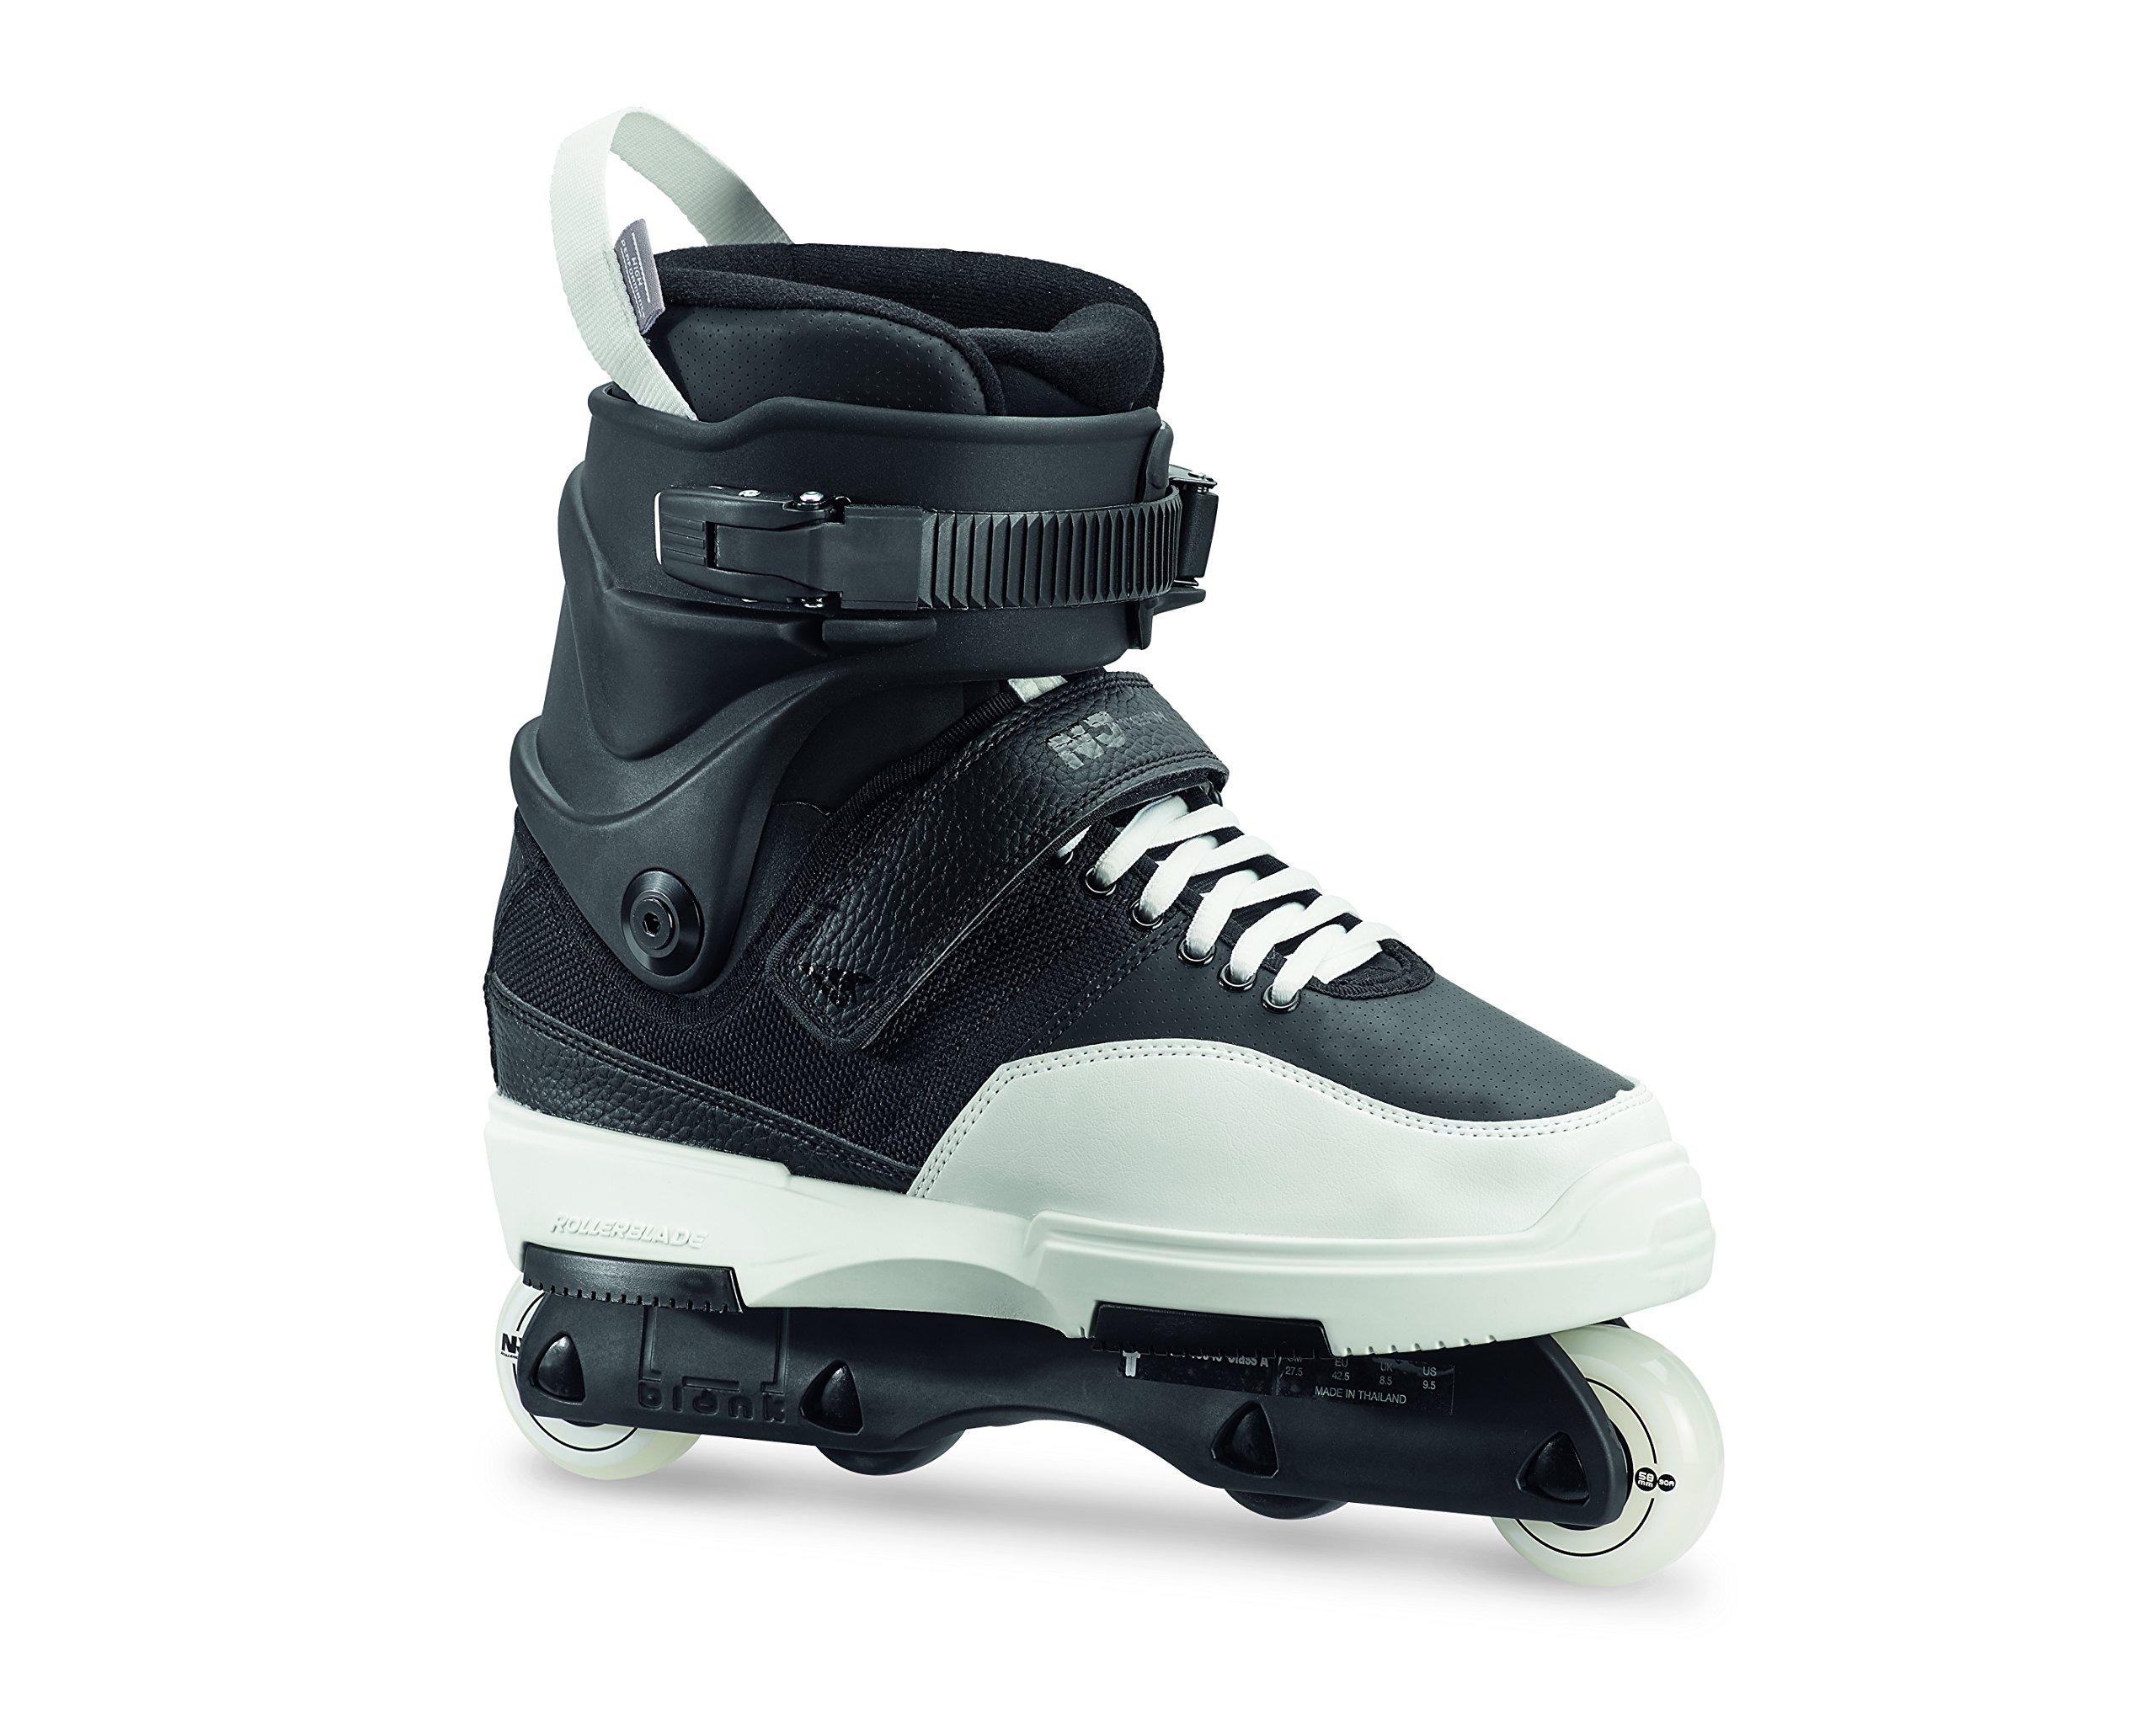 Rollerblade Men's Nj Team Street Inline Skate, Black/White, Size 12.5